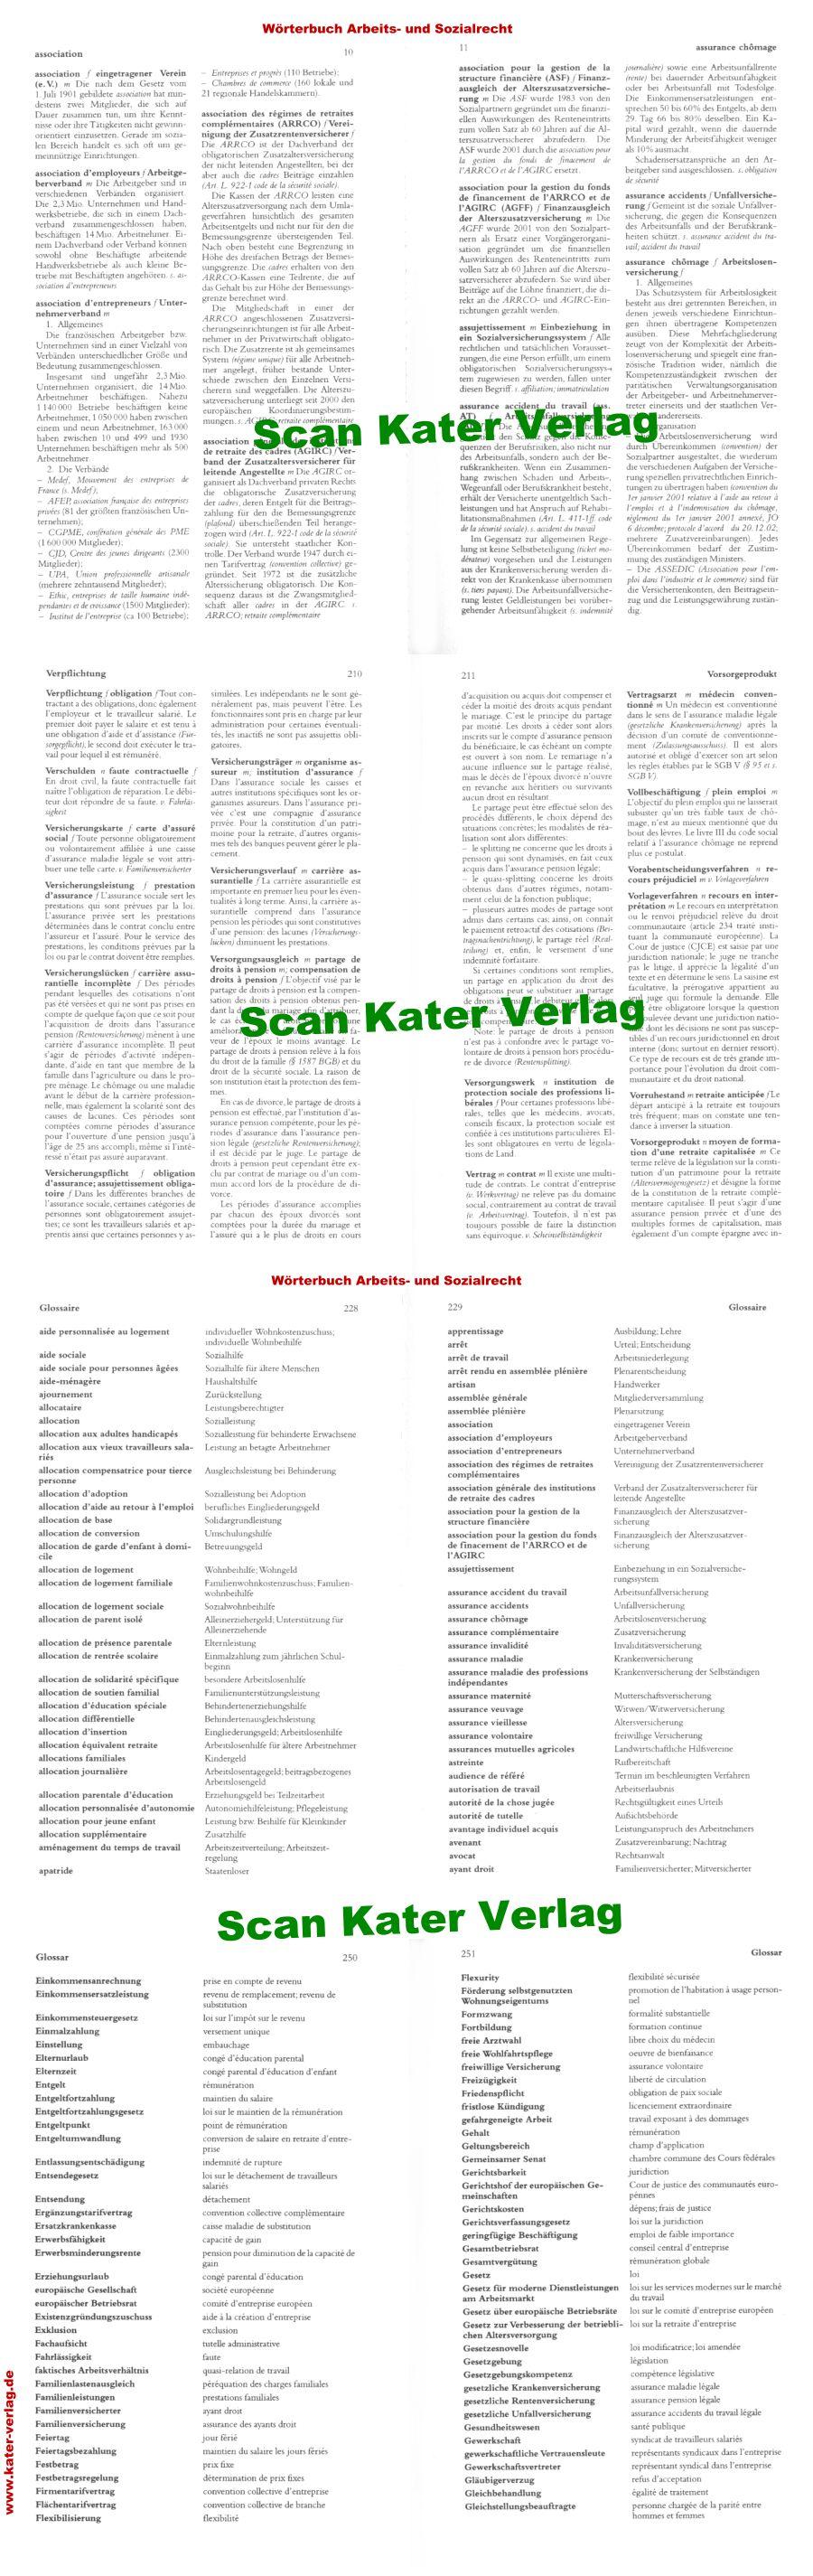 Wörterbuch Arbeits- und Sozialrecht FR-DE, DE-FR